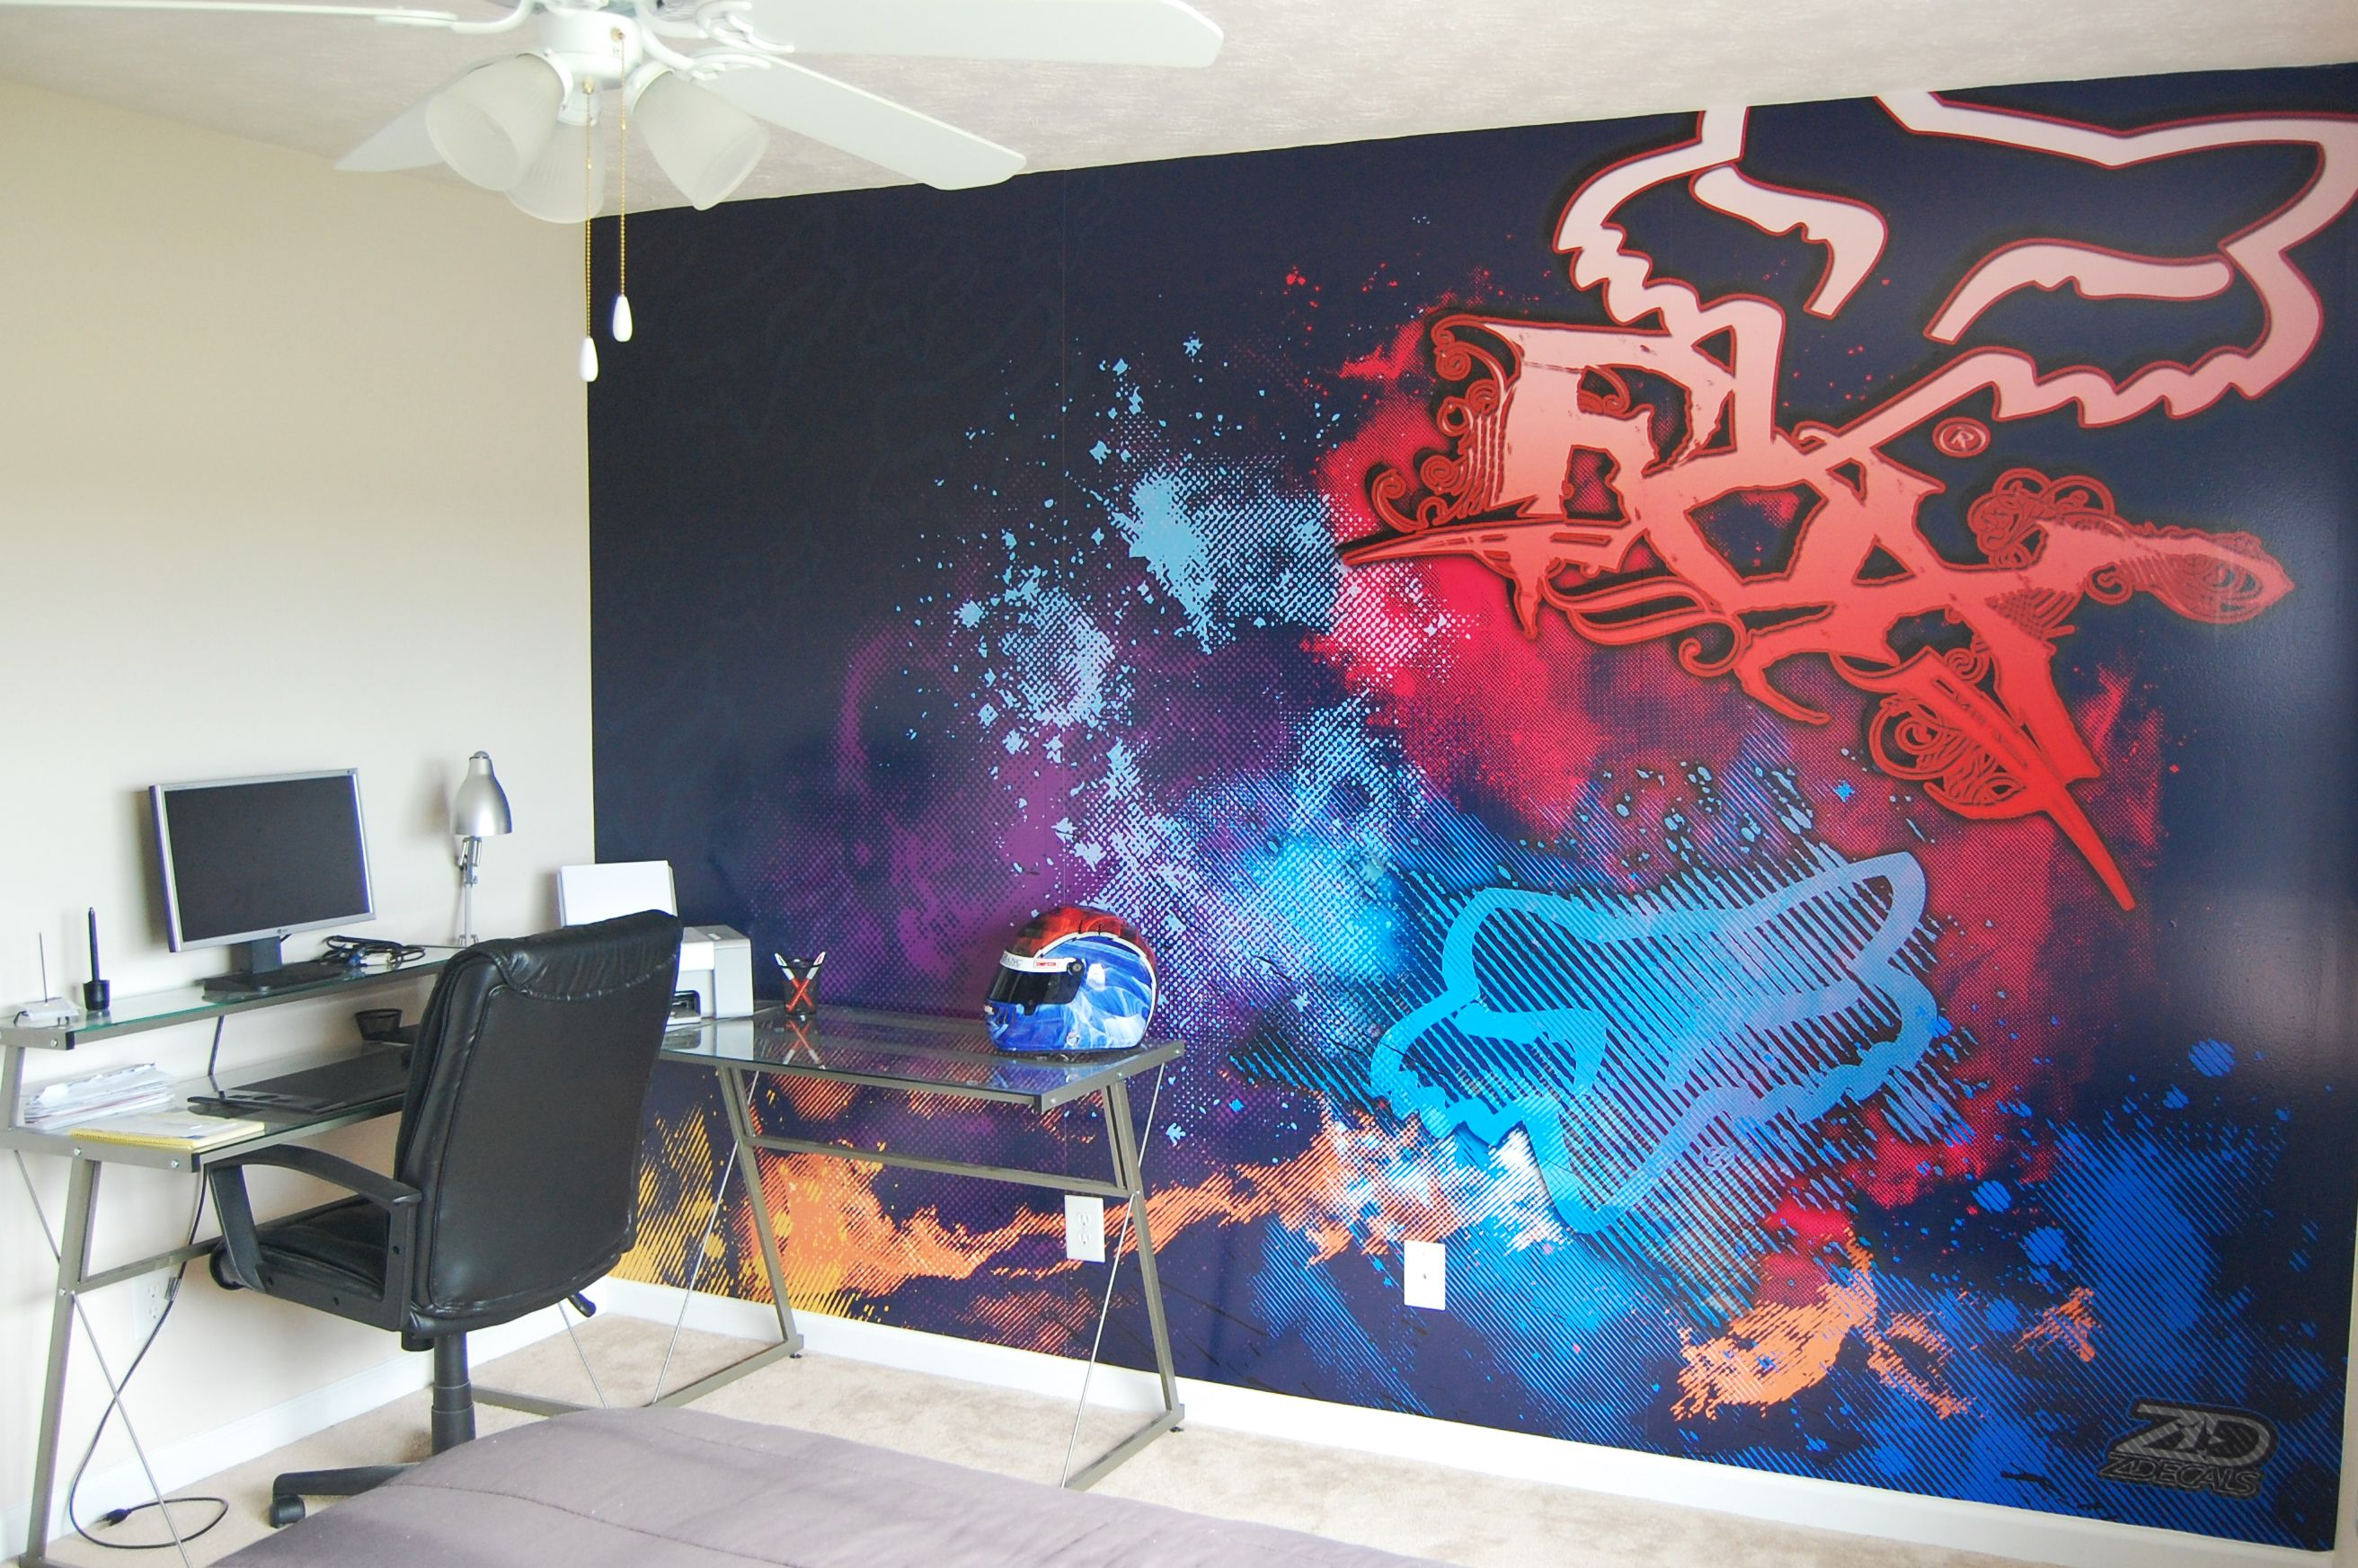 FOX RACING wall design-i love this!   Decor   Pinterest   Fox ...